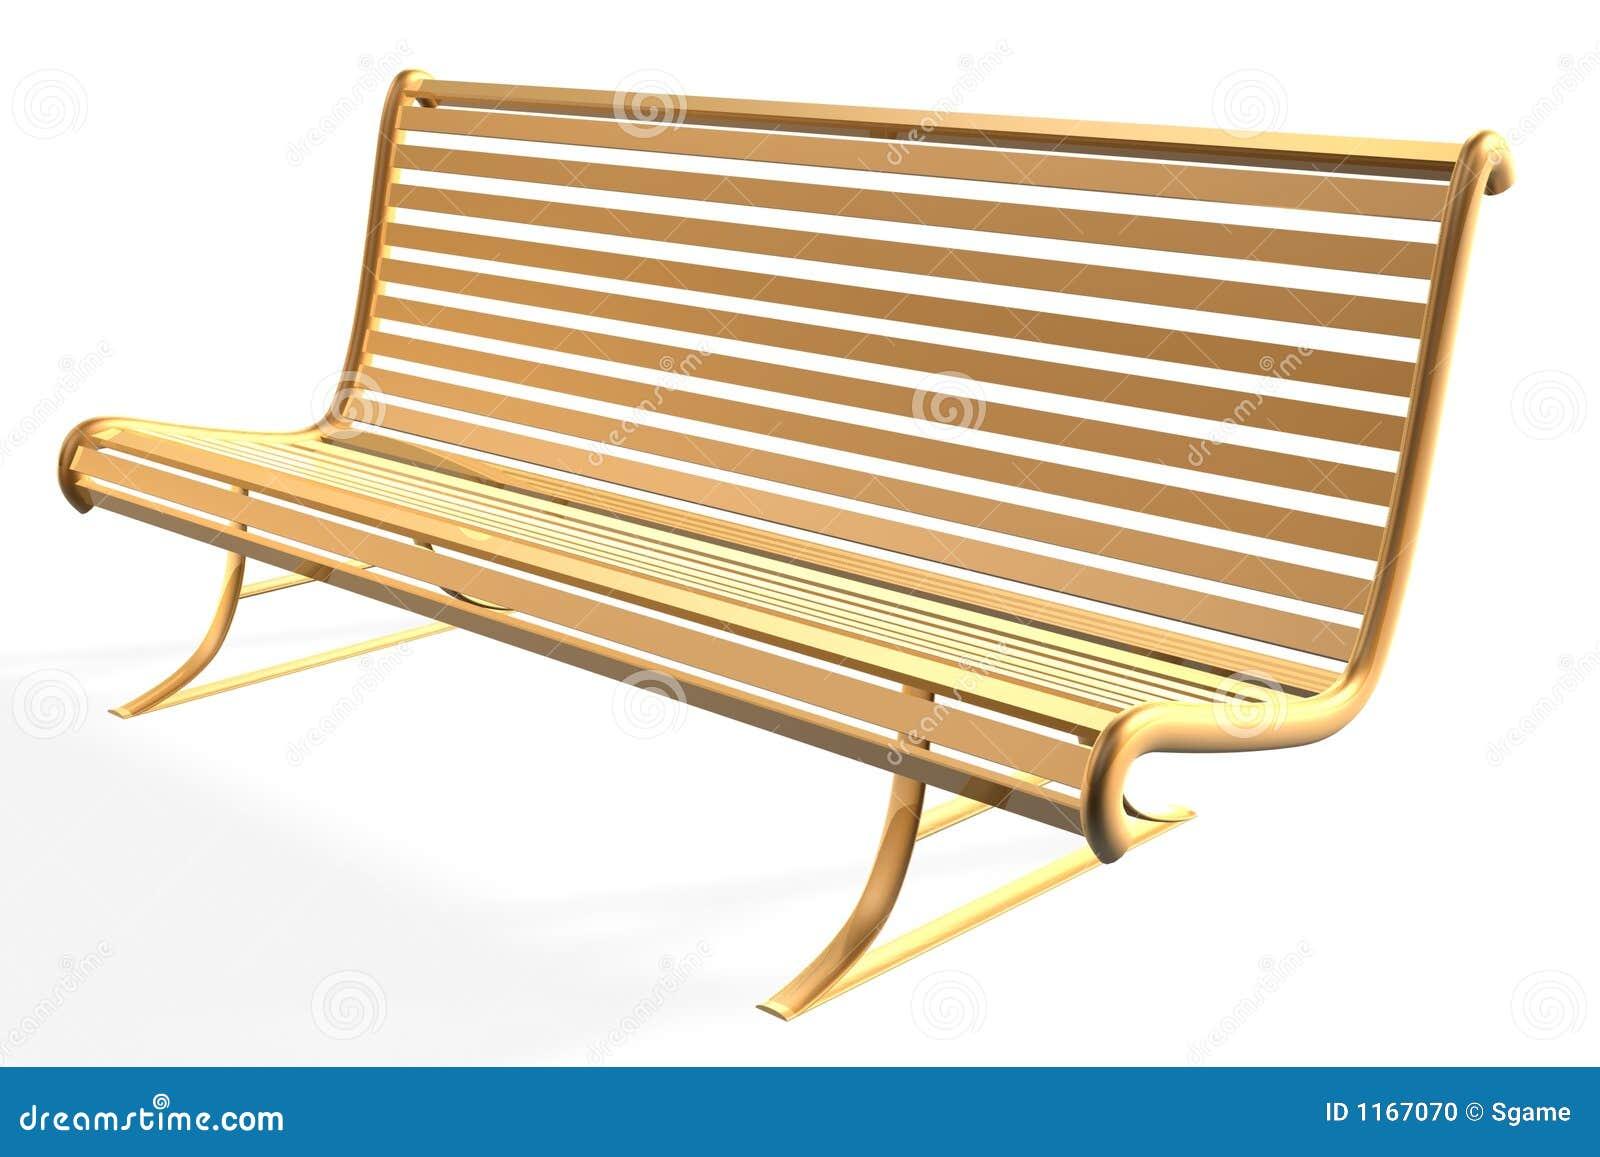 bench stock photo image 1167070